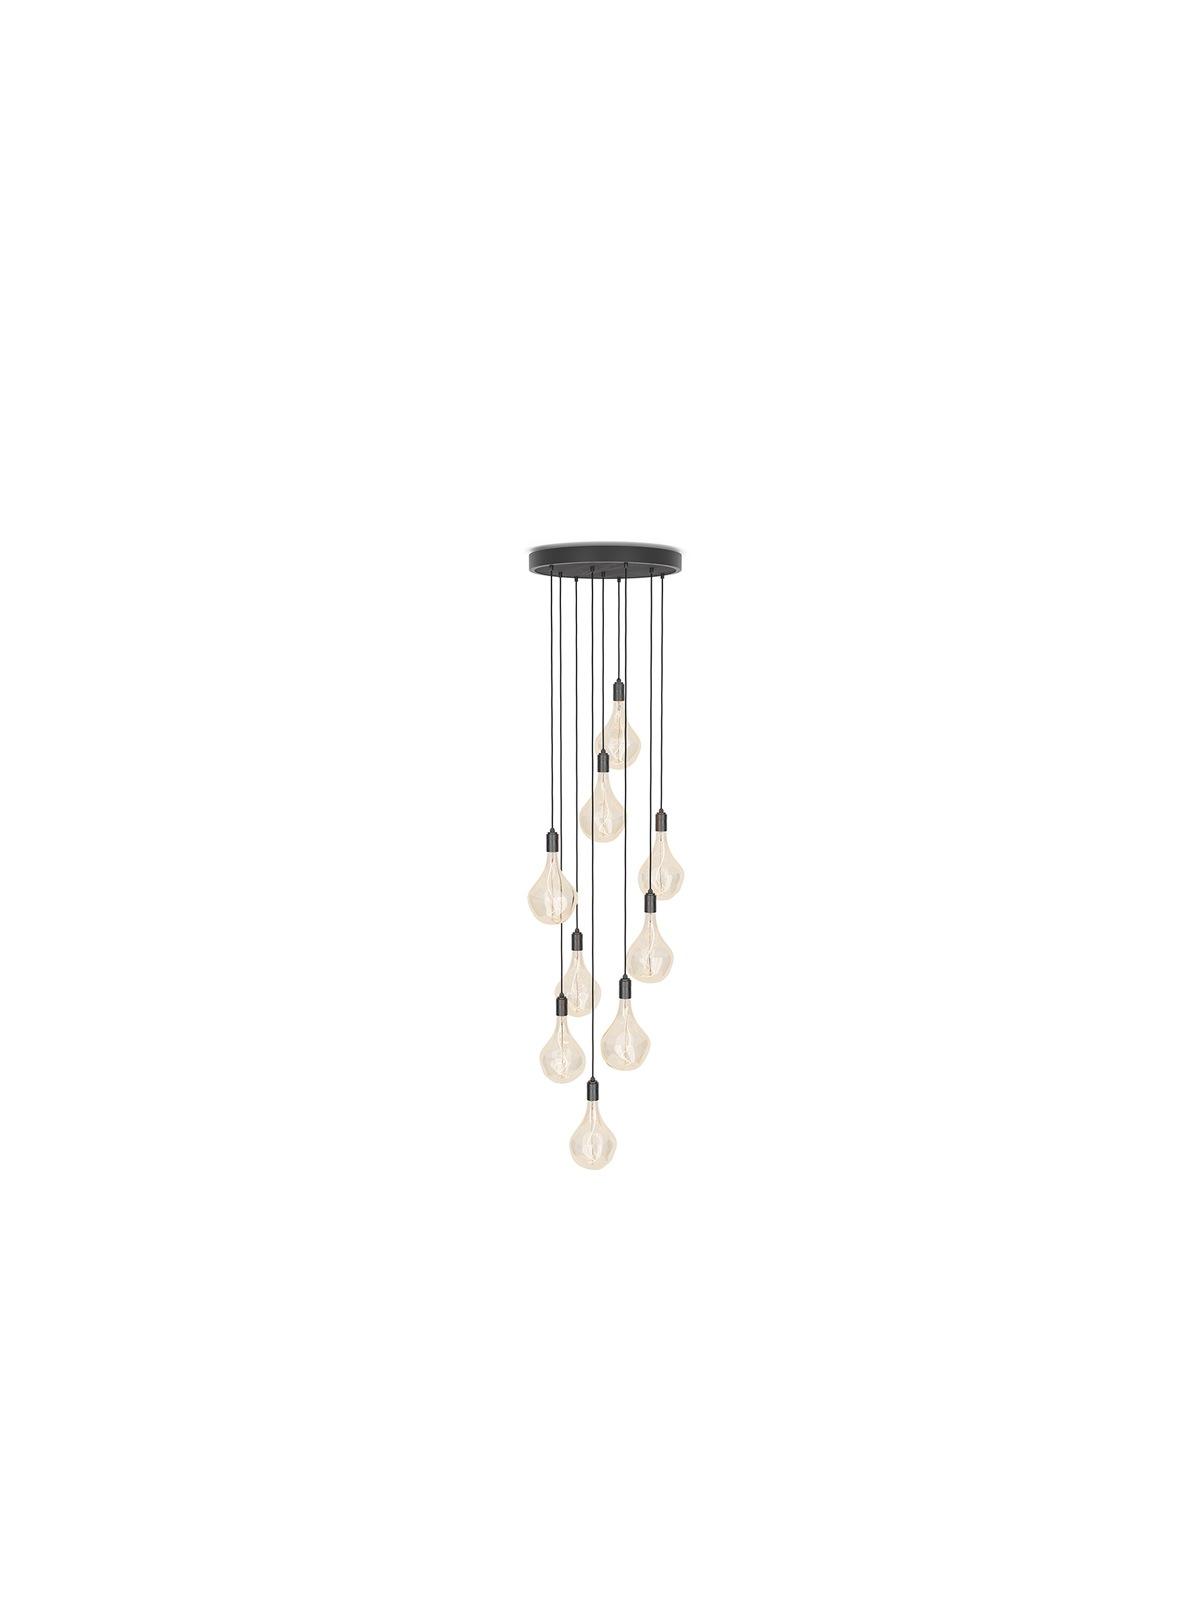 Nine Pendant Large Canopy Tala Cluster neunflammige Pendelleuchte DesignOrt Lampen Onlineshop Berlin